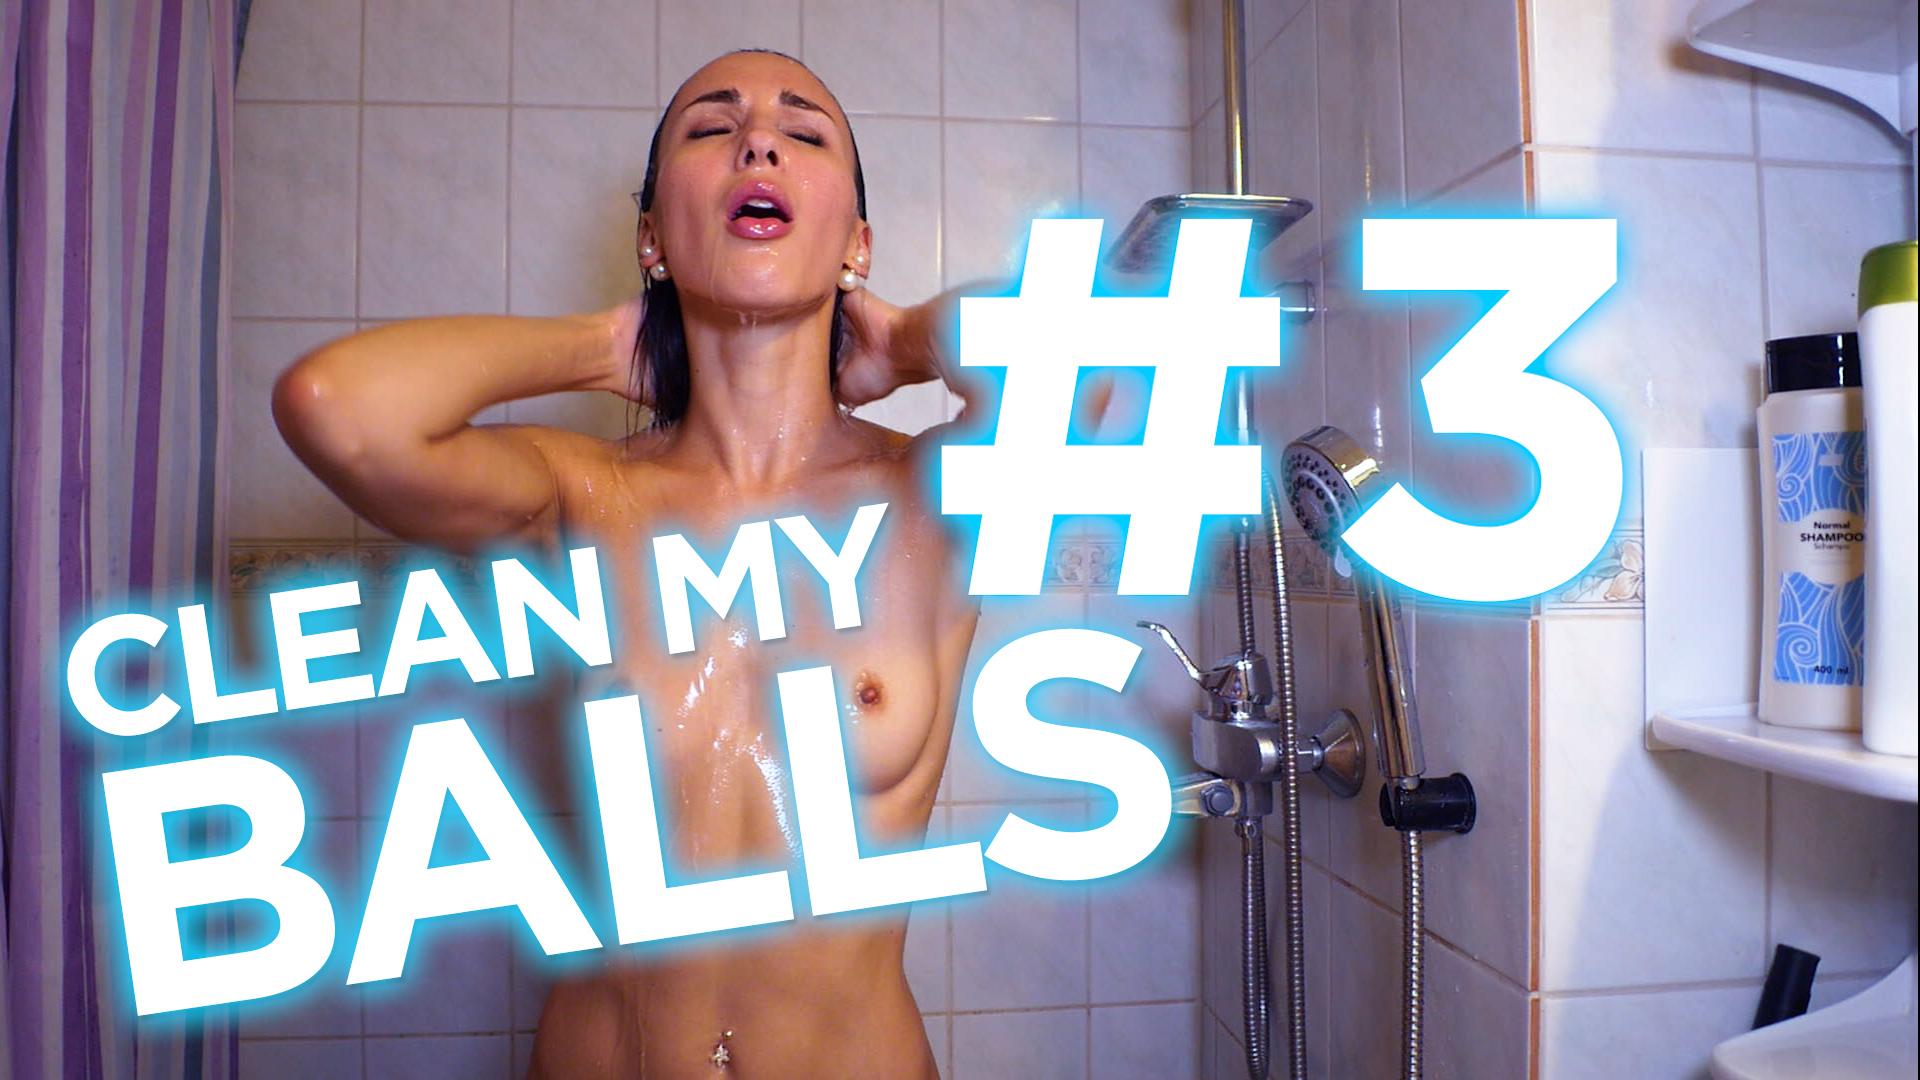 Clean my balls #3 - SWEETYX